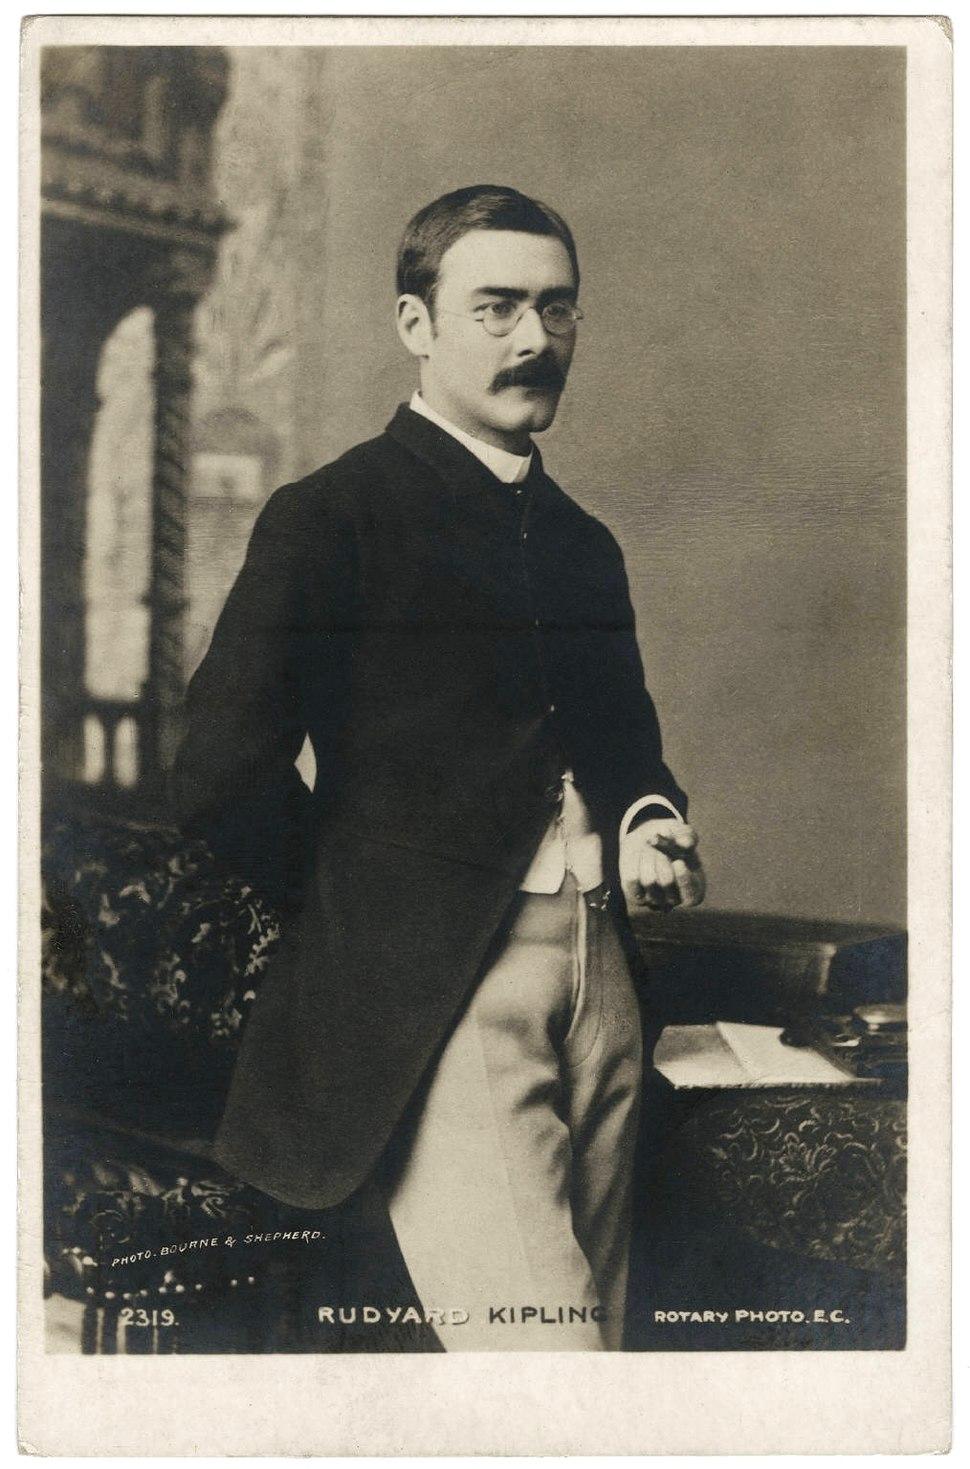 Rudyard Kipling three quarter length portrait